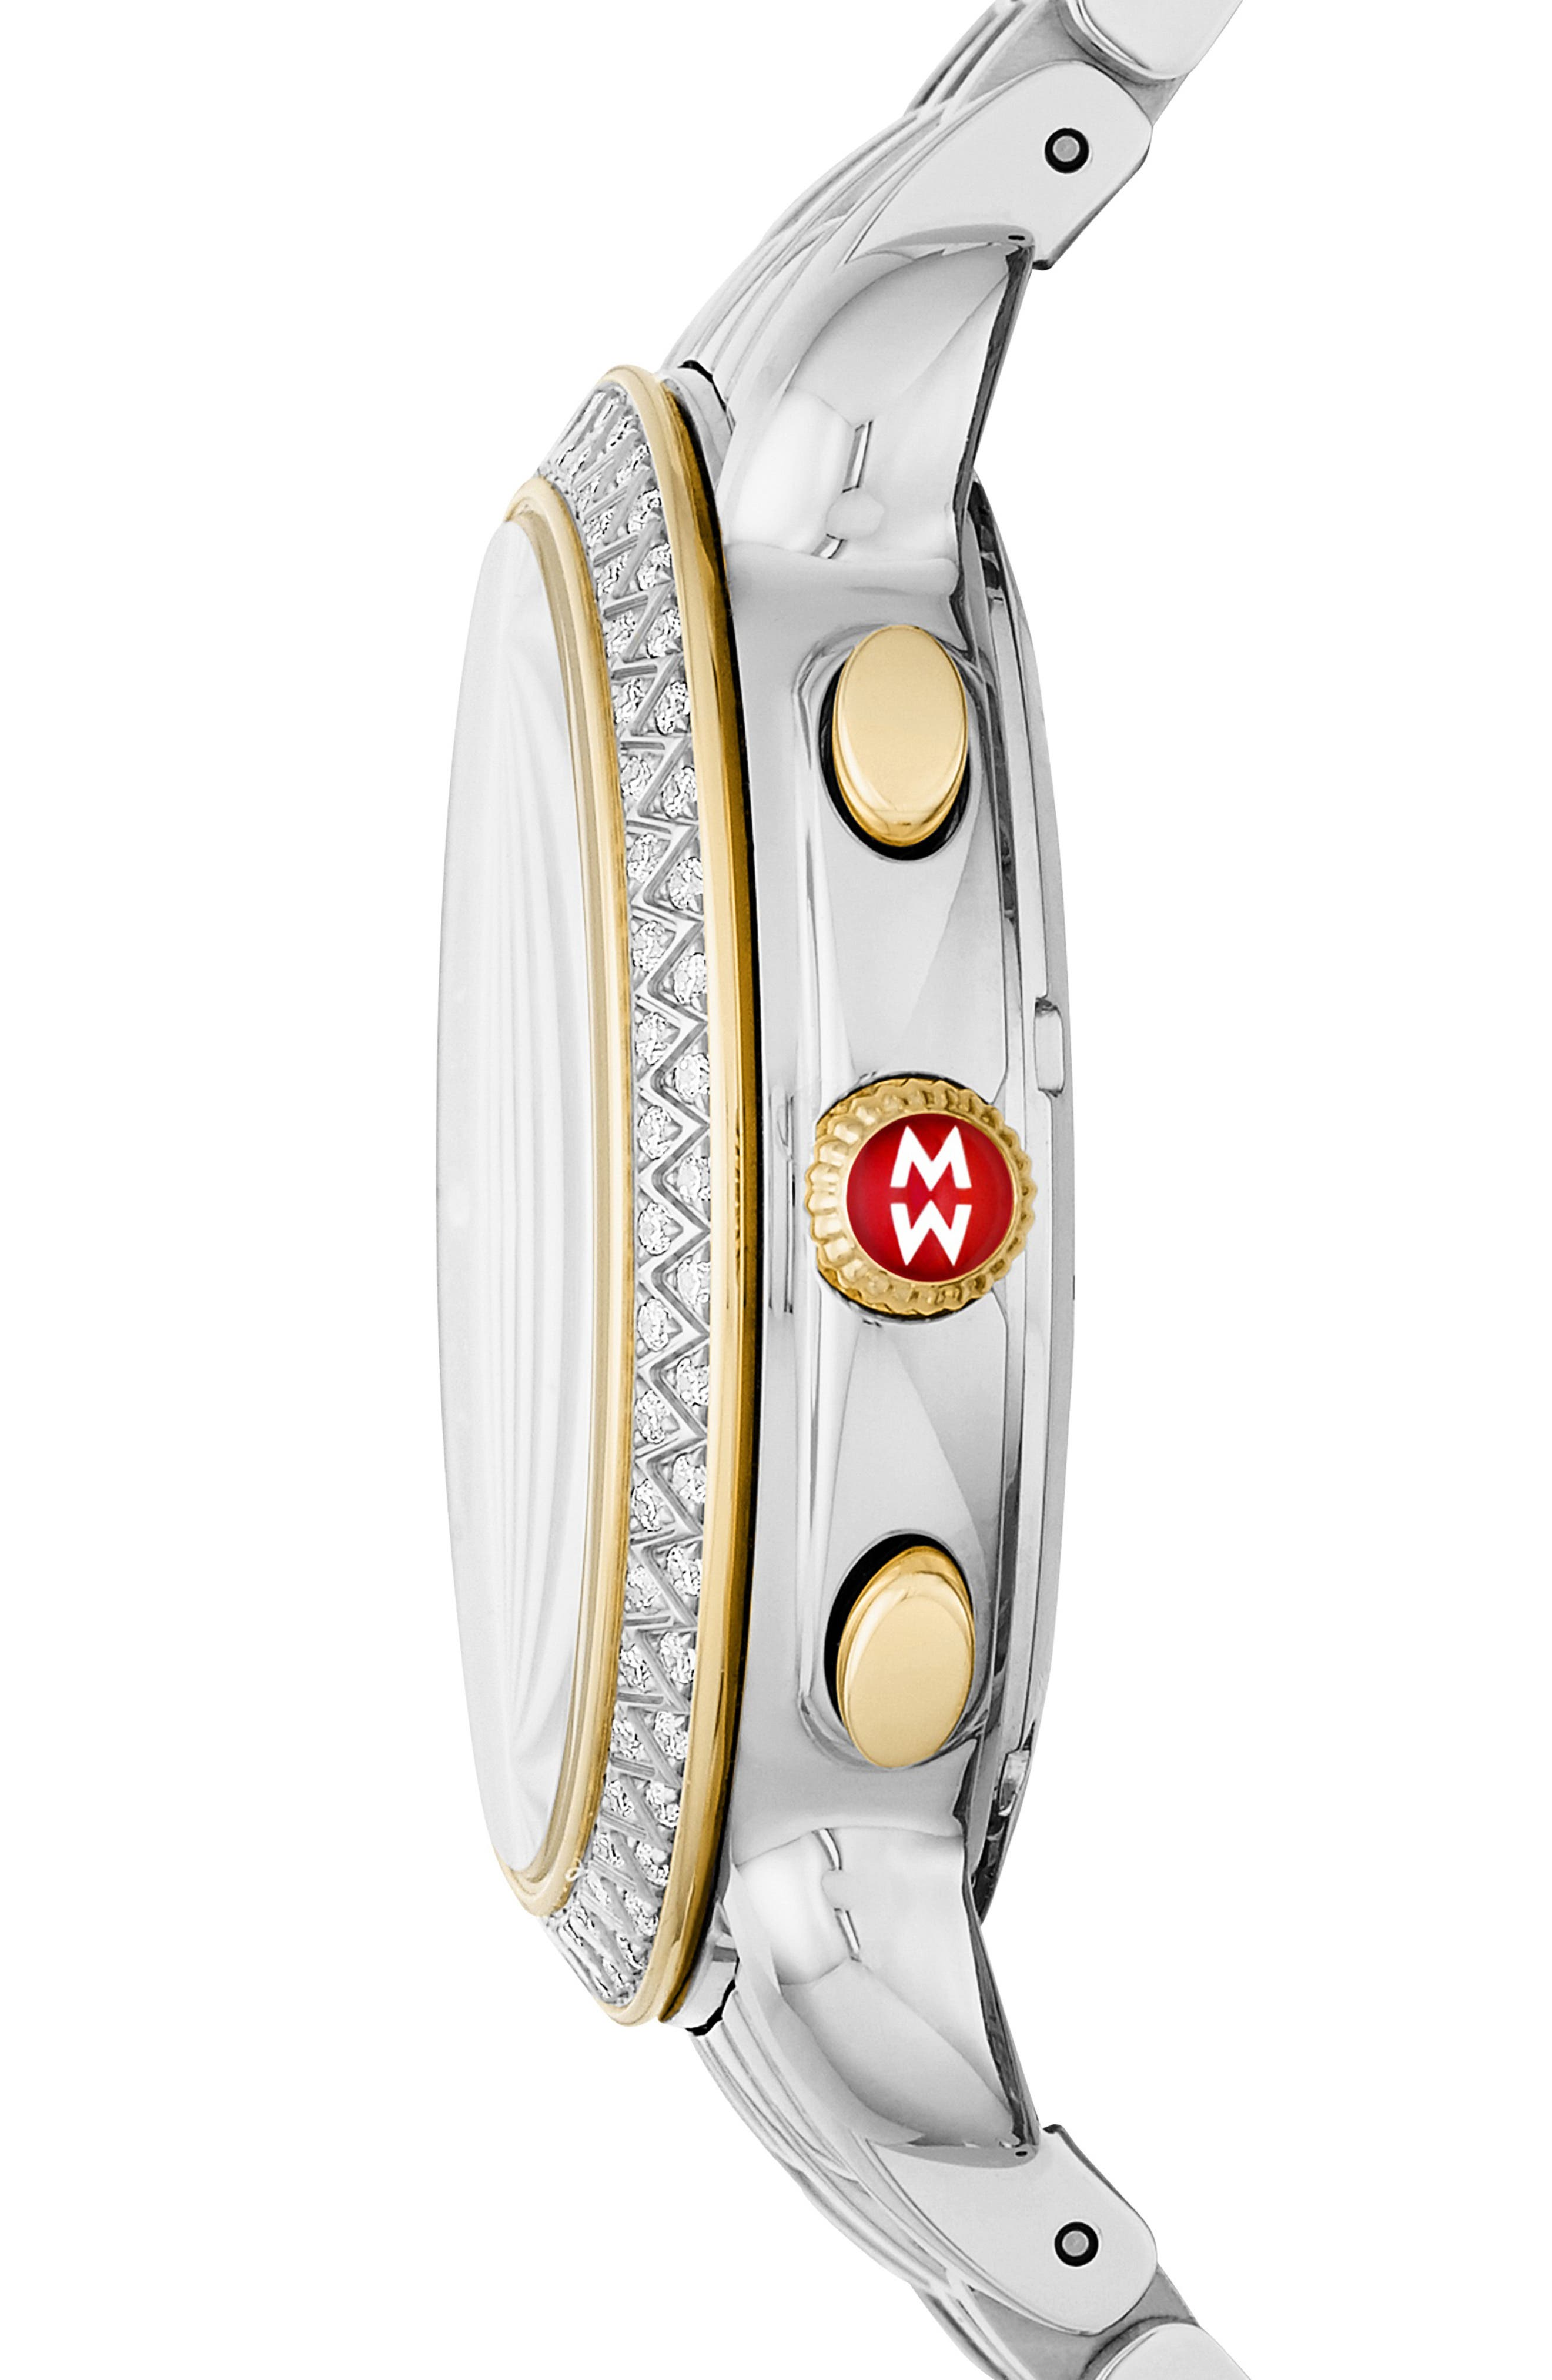 Sidney Chrono Diamond Diamond Dial Watch Case, 38mm,                             Alternate thumbnail 2, color,                             GOLD/ SILVER/ DESERT ROSE MOP